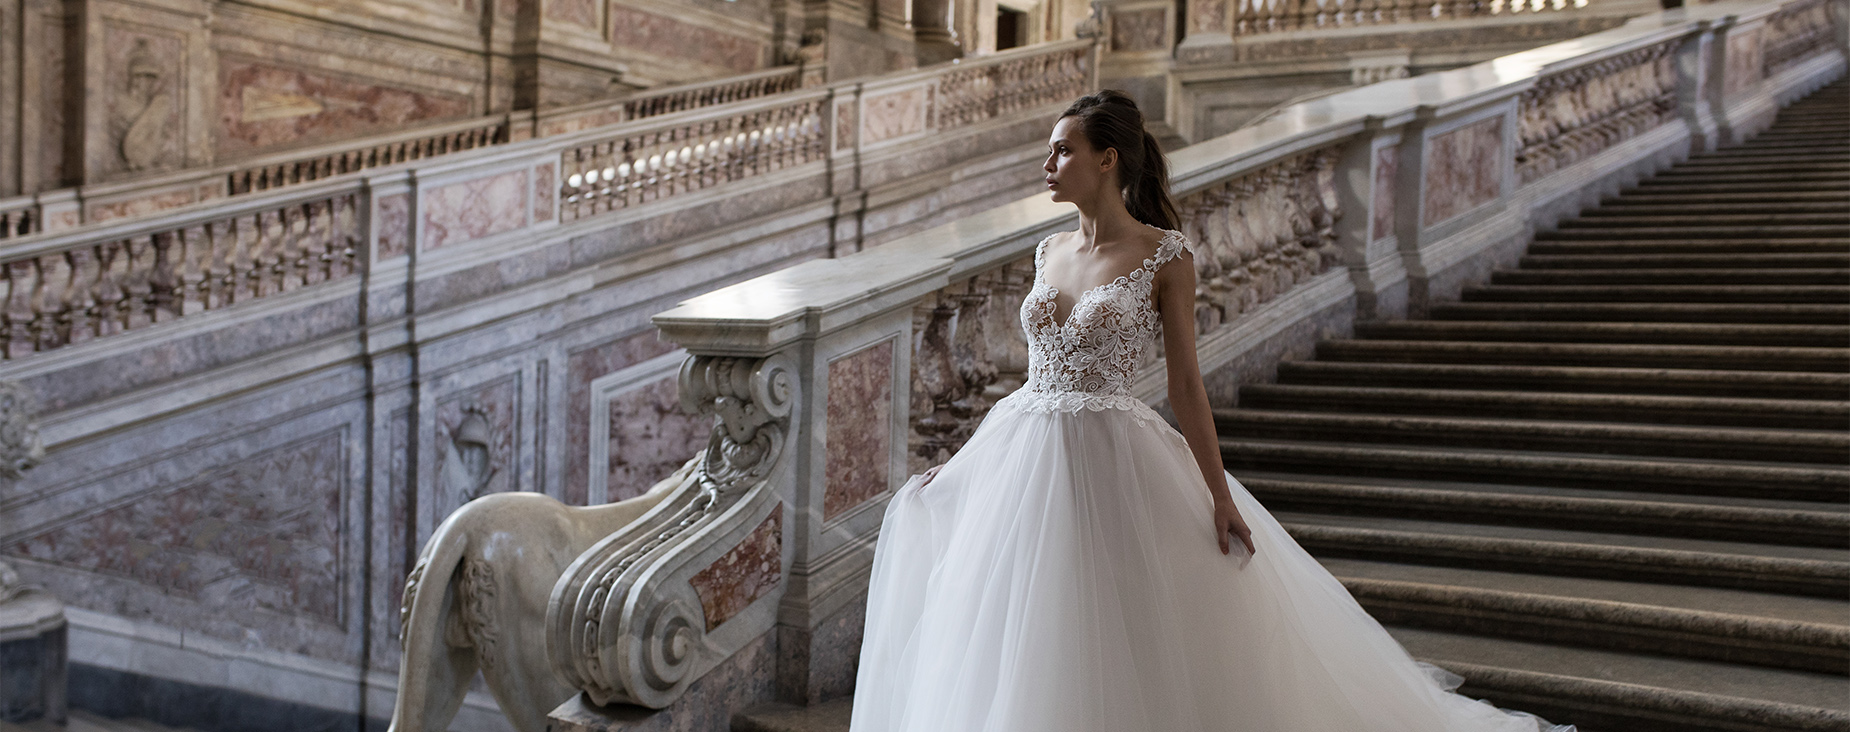 Bridal Boutique Brentwood Essex